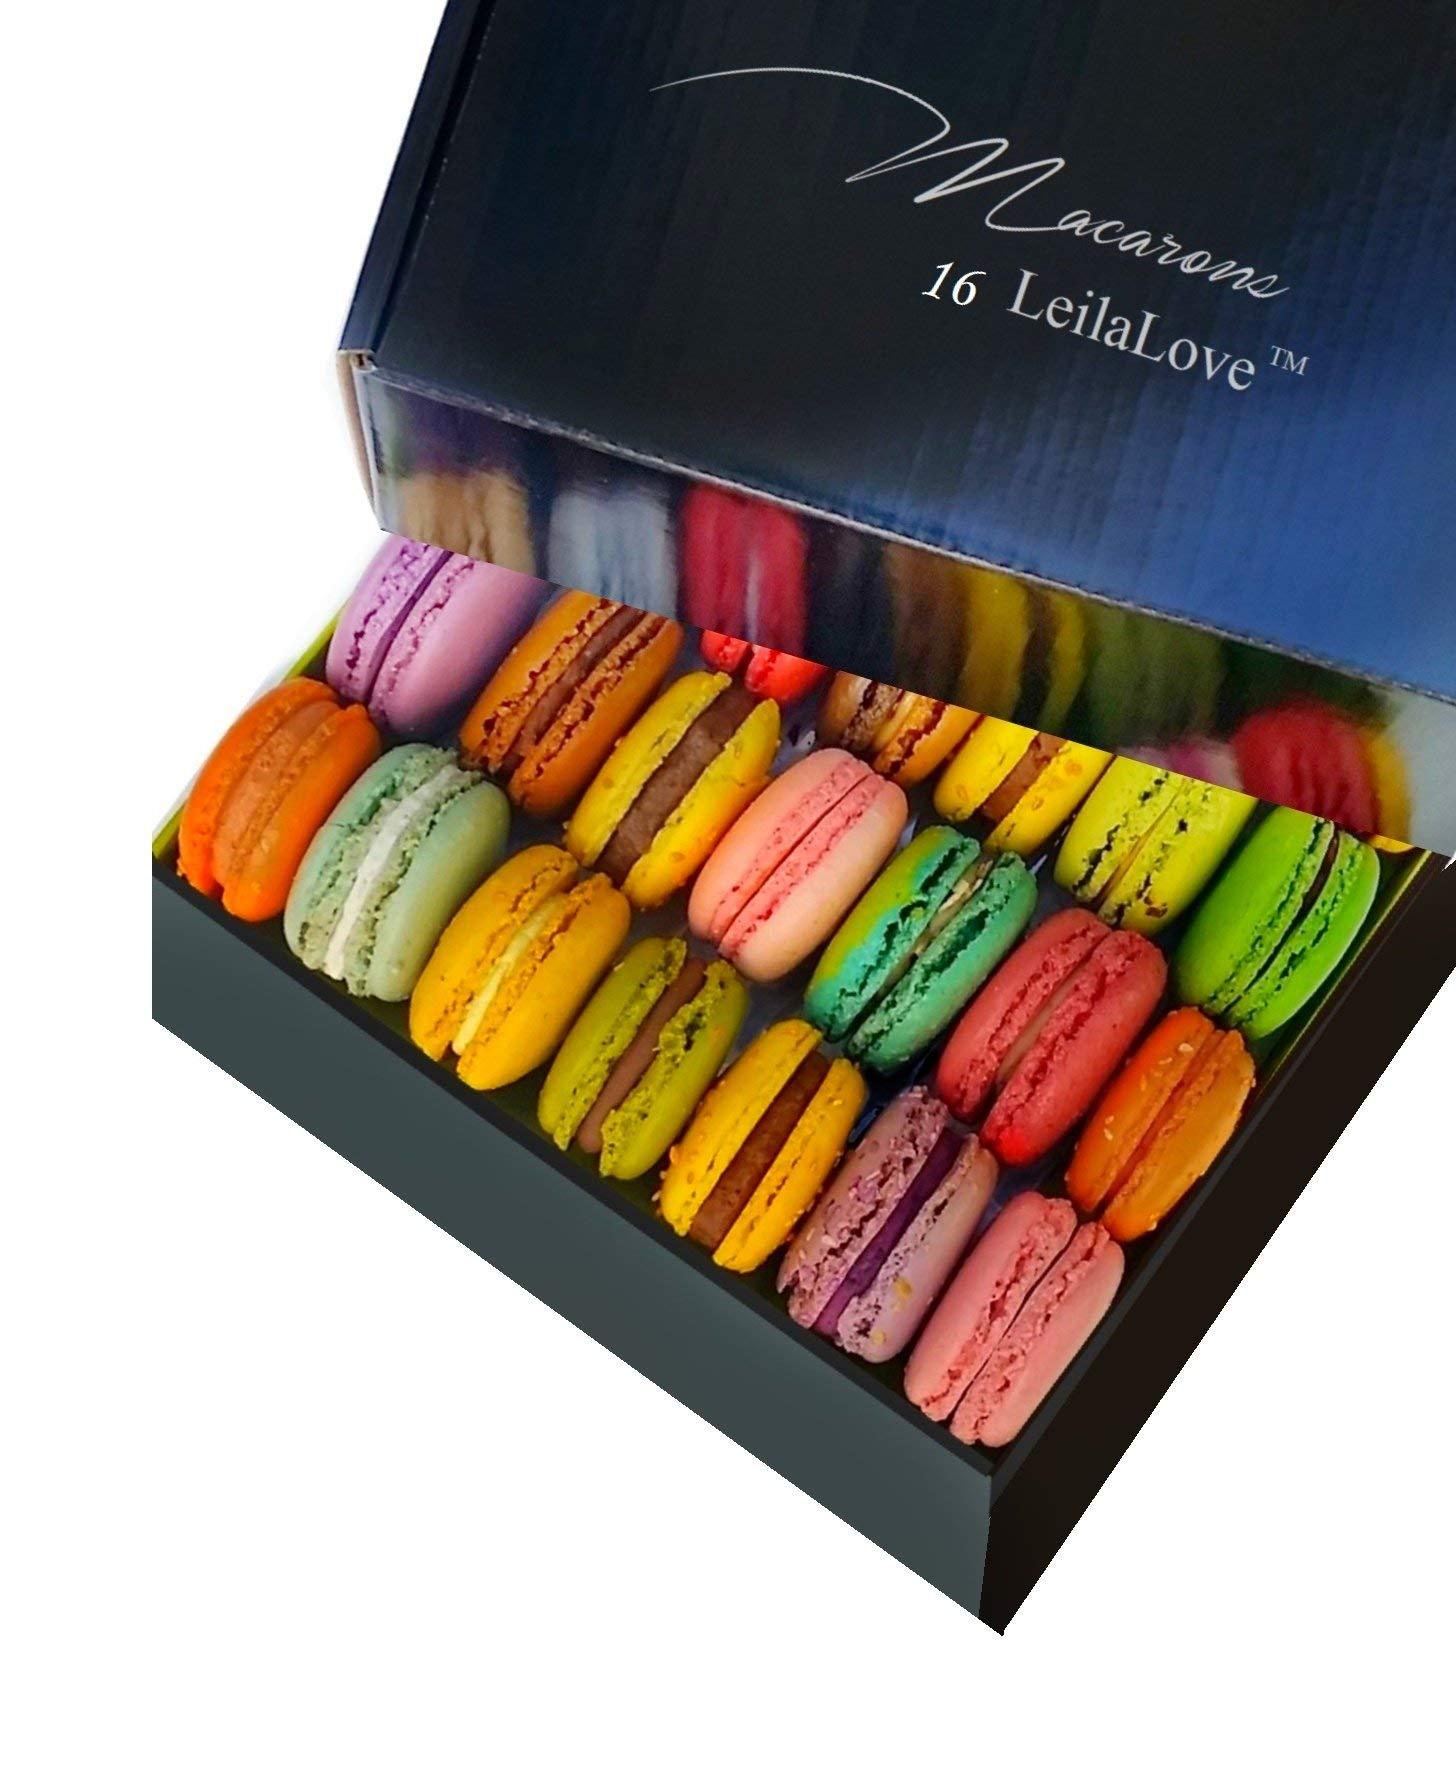 Leilalove Macarons - 16 Parisian Macaron Collections of dozen Flavors - Elegant Gentleman style gift box - Baked to Order